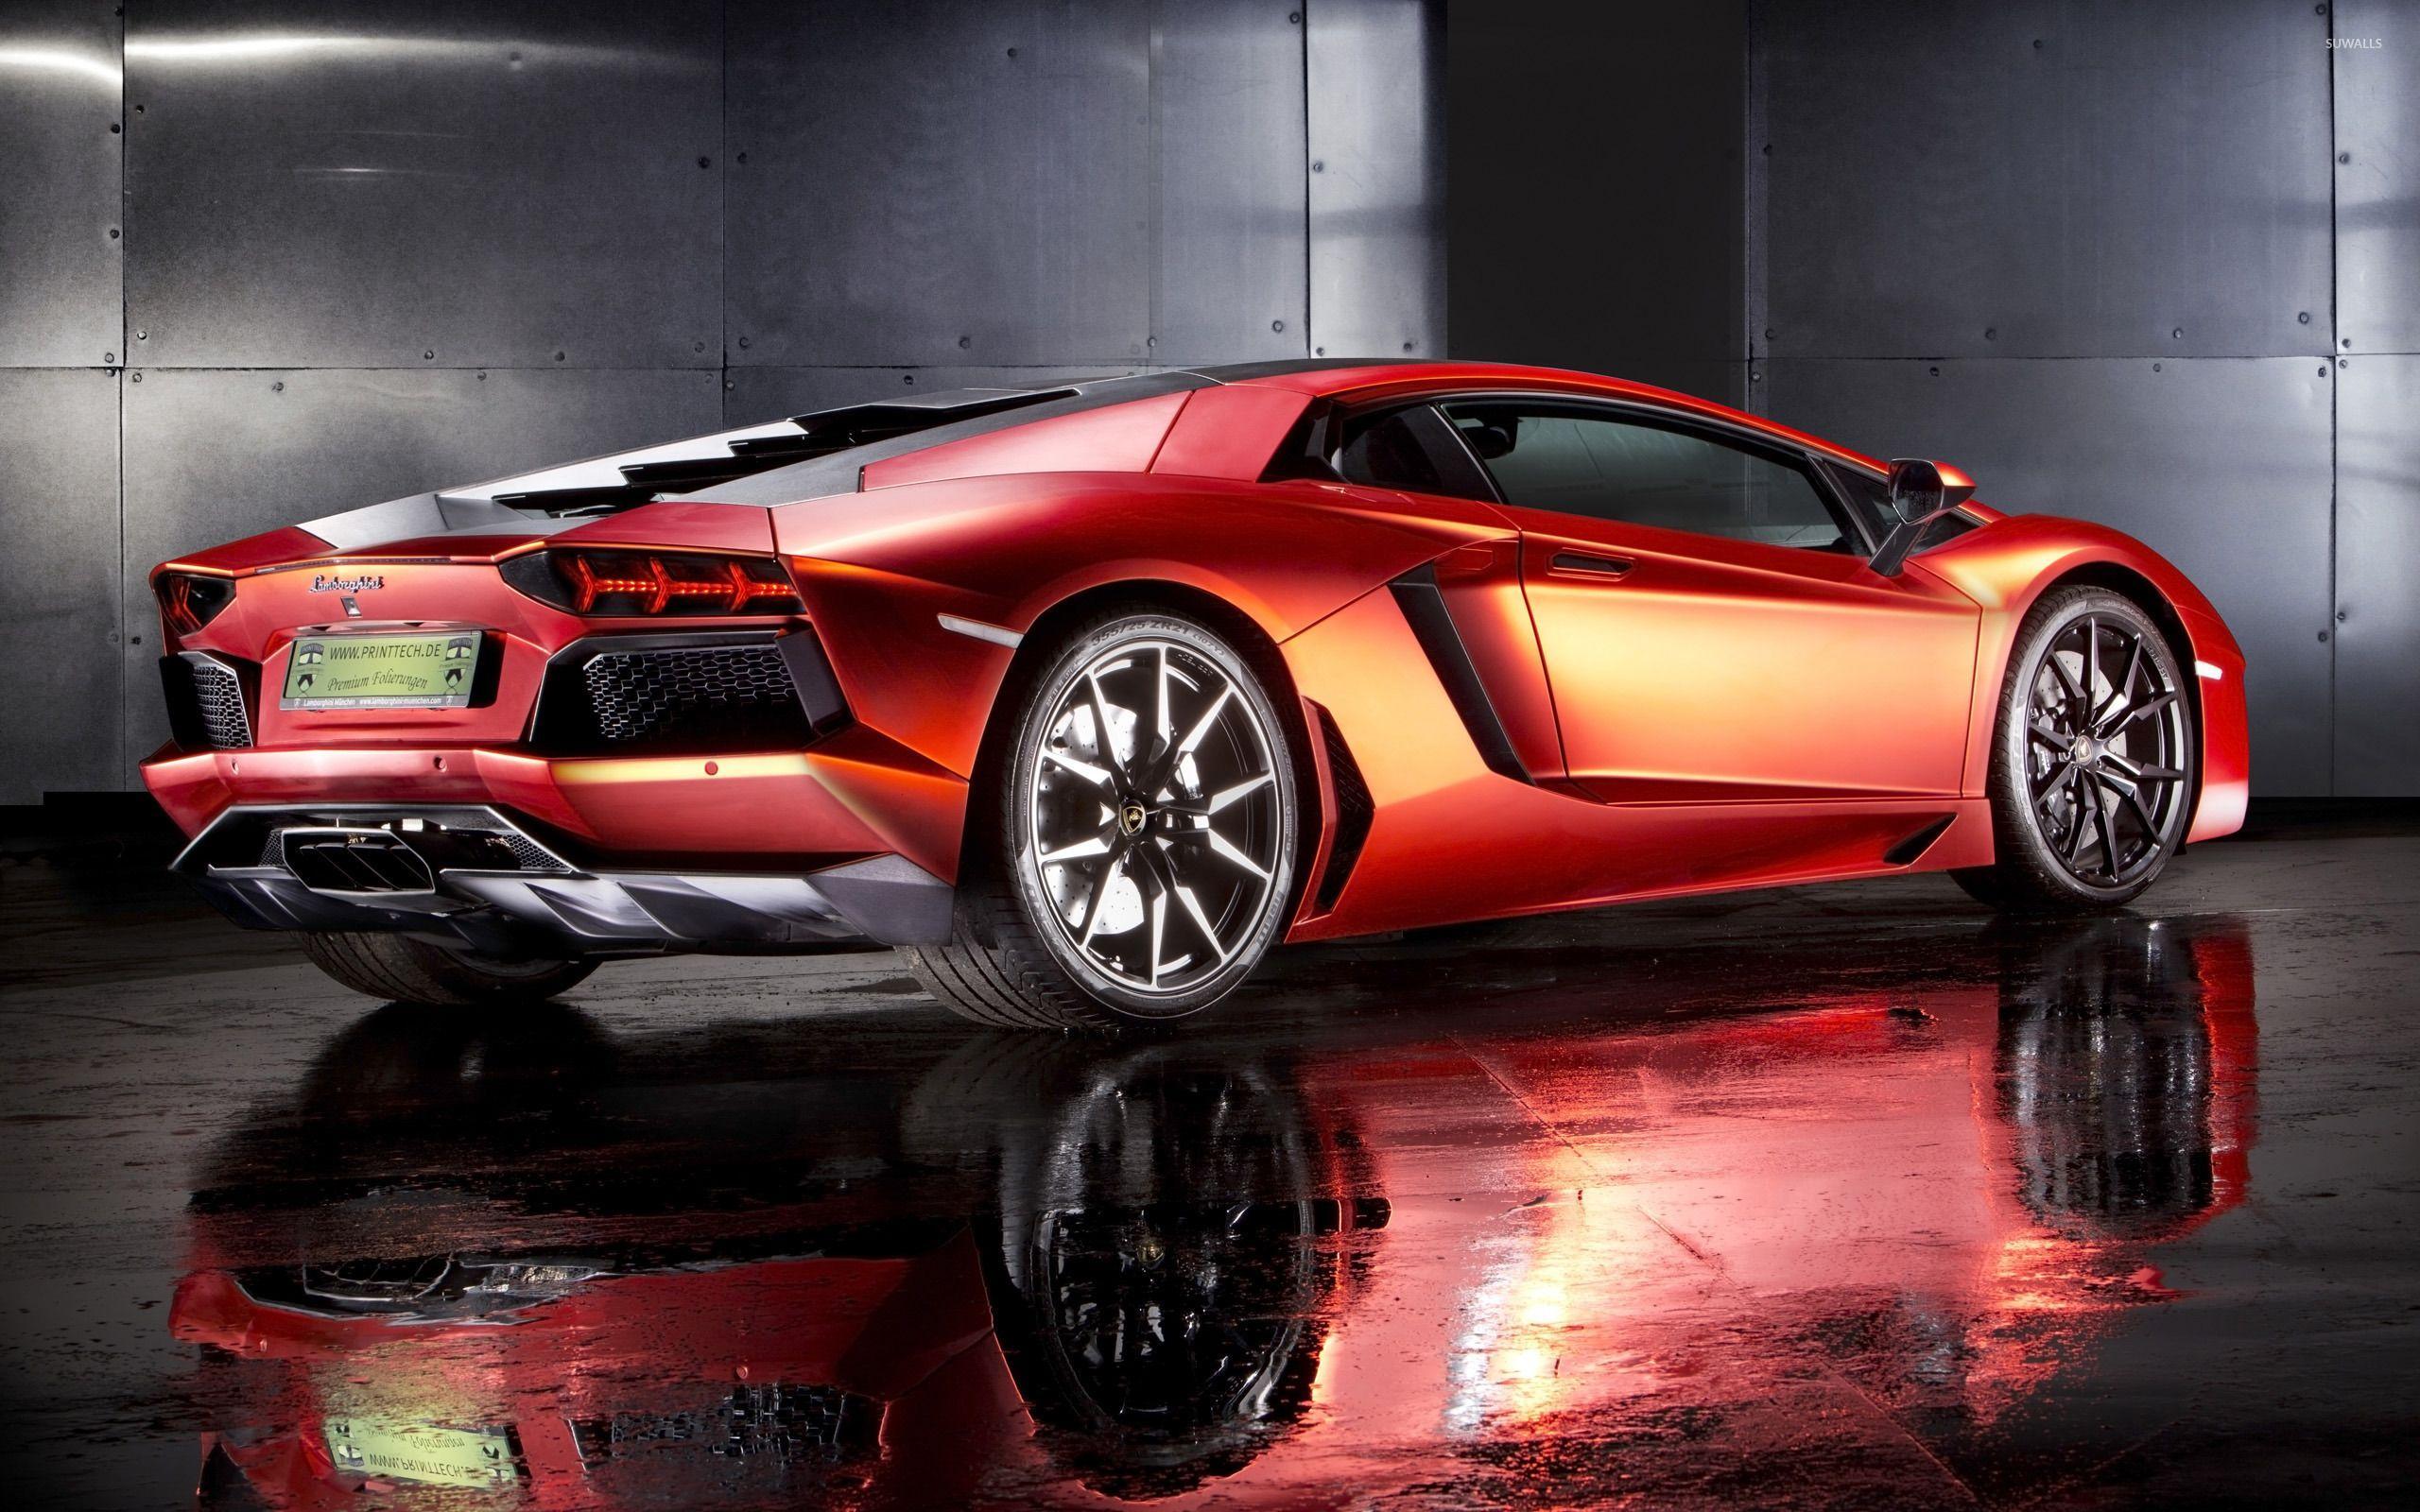 Lamborghini Sesto Elemento Wallpaper , Lamborghini Sesto